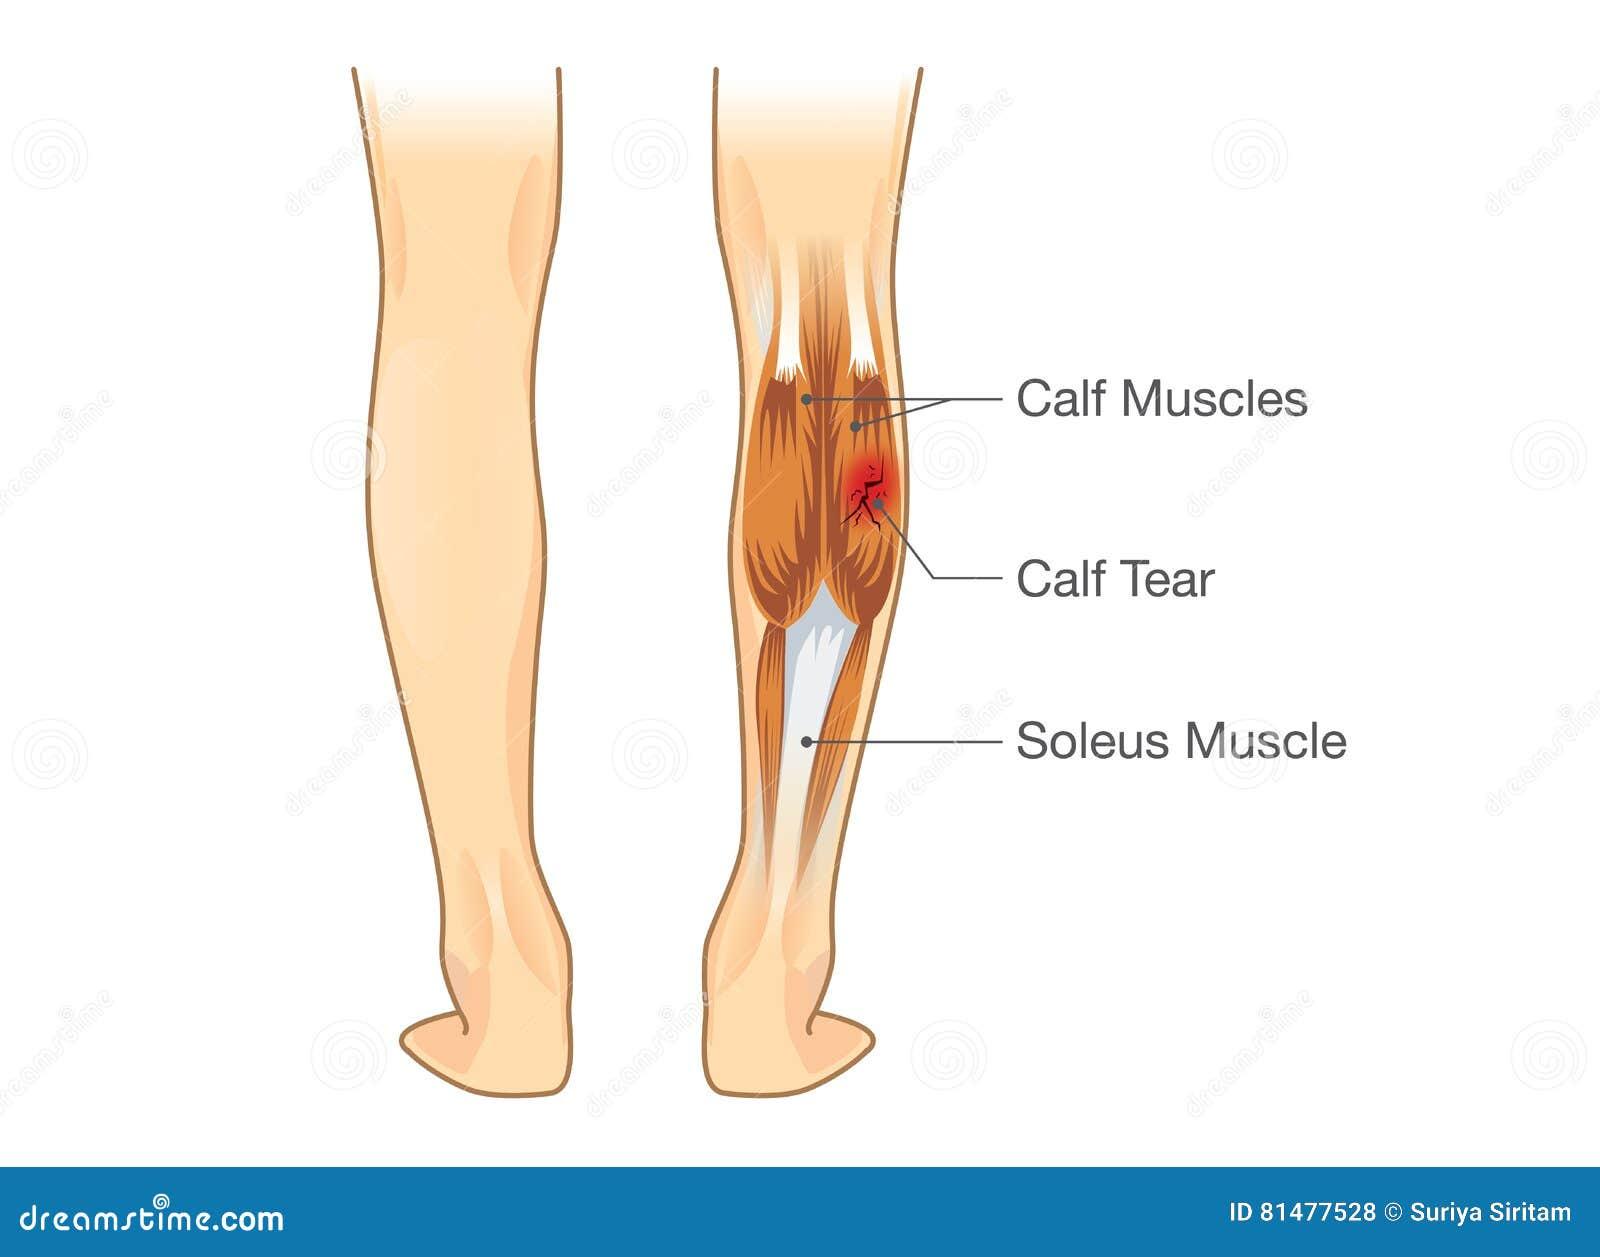 Calf Muscle Tear Stock Vector Illustration Of Illustration 81477528